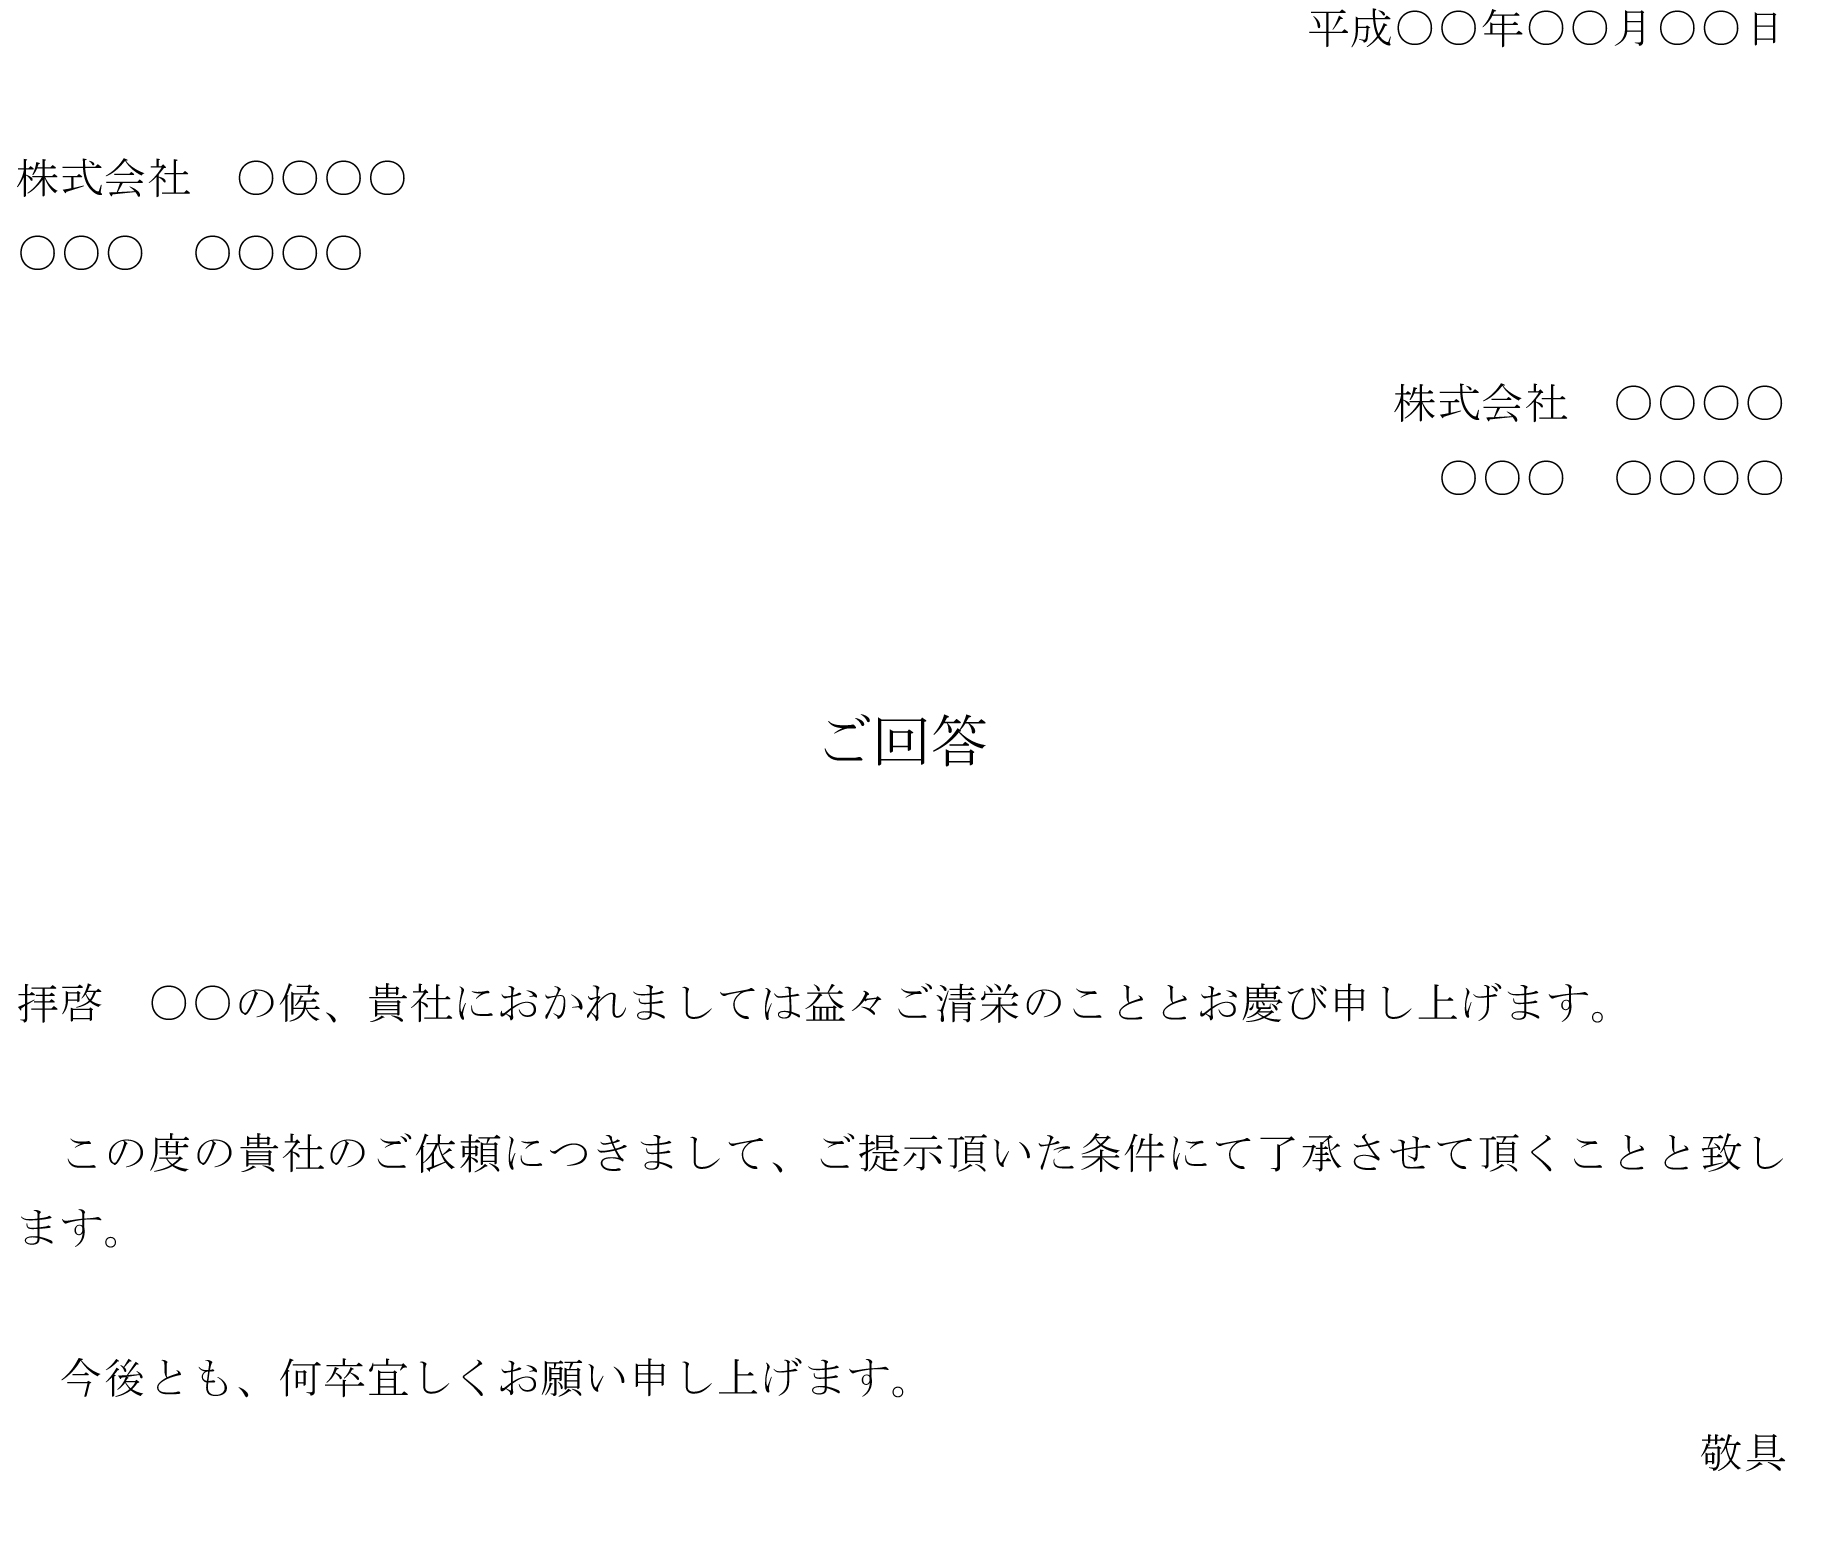 回答書(取引条件の変更依頼を承諾)02